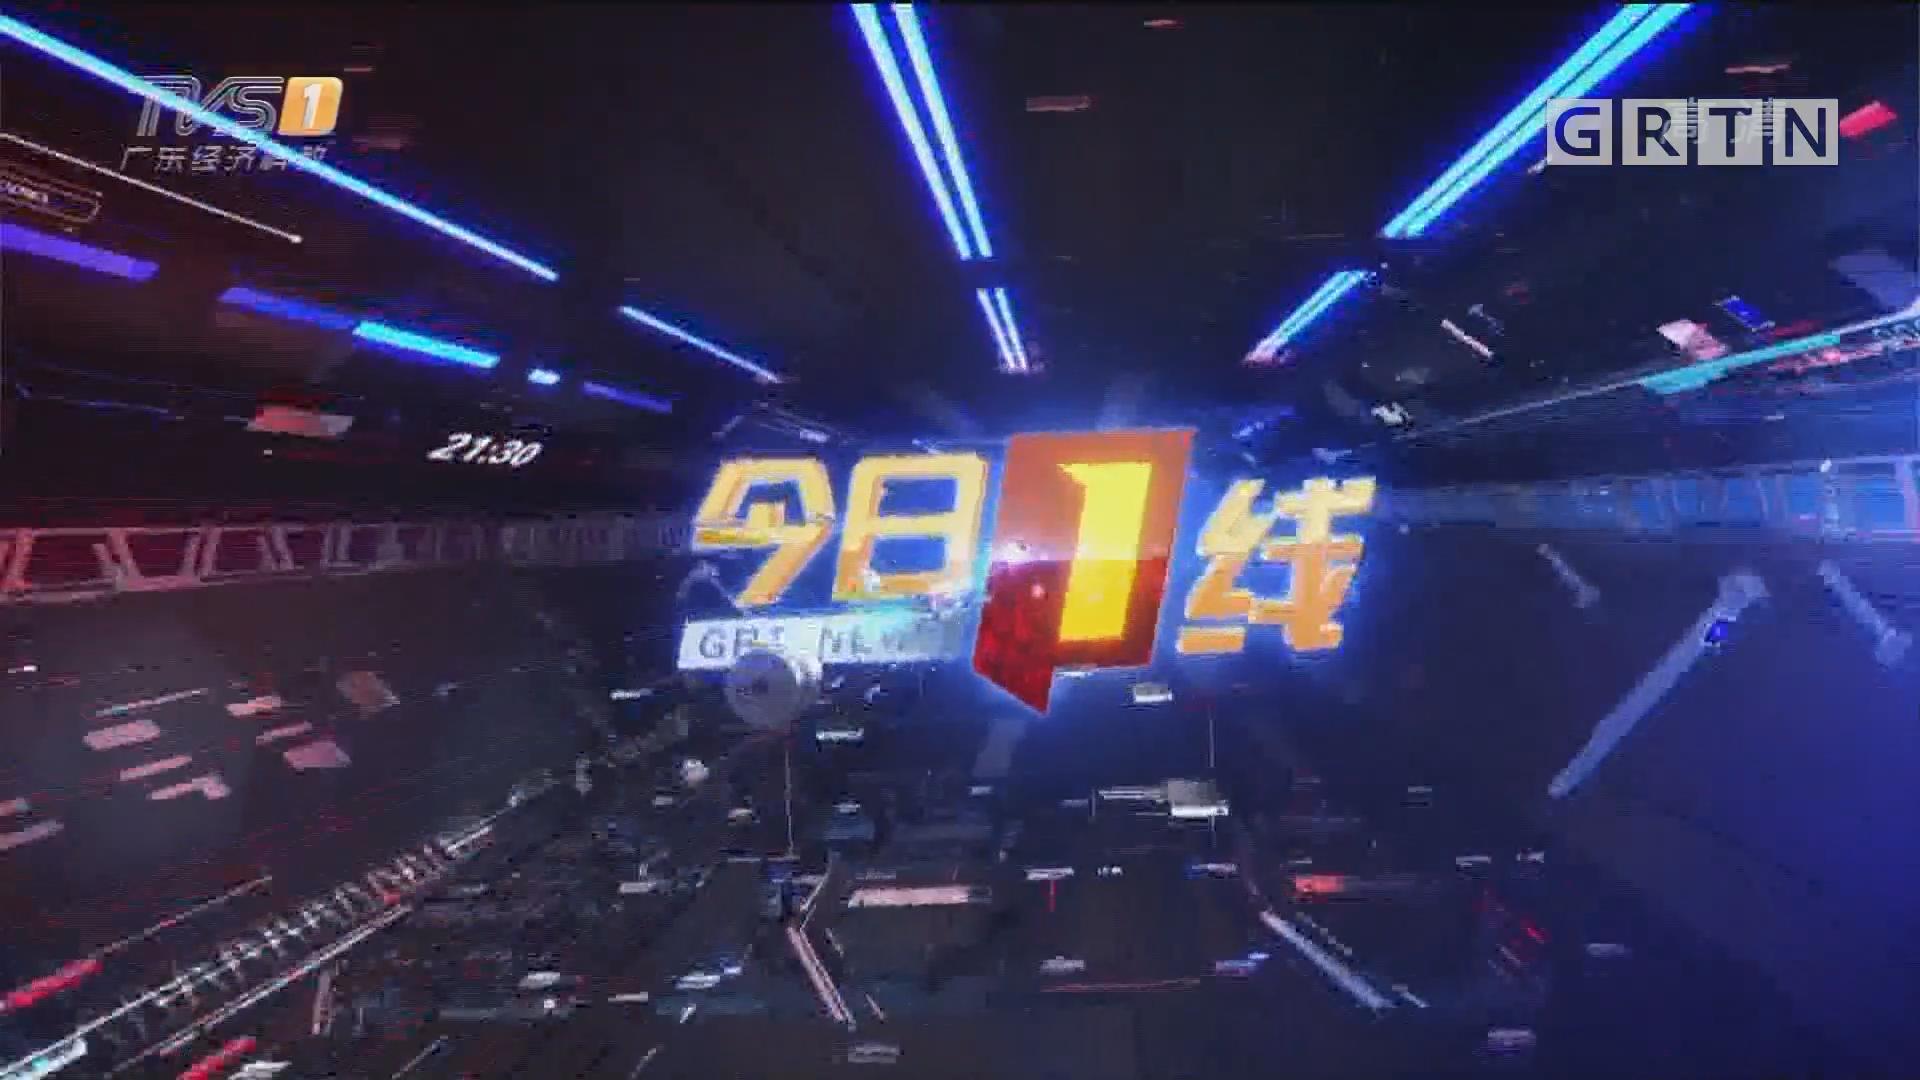 [HD][2019-06-28]今日一線:廣州黃埔區:男子持剪刀兩天連傷兩人 警方全力緝捕